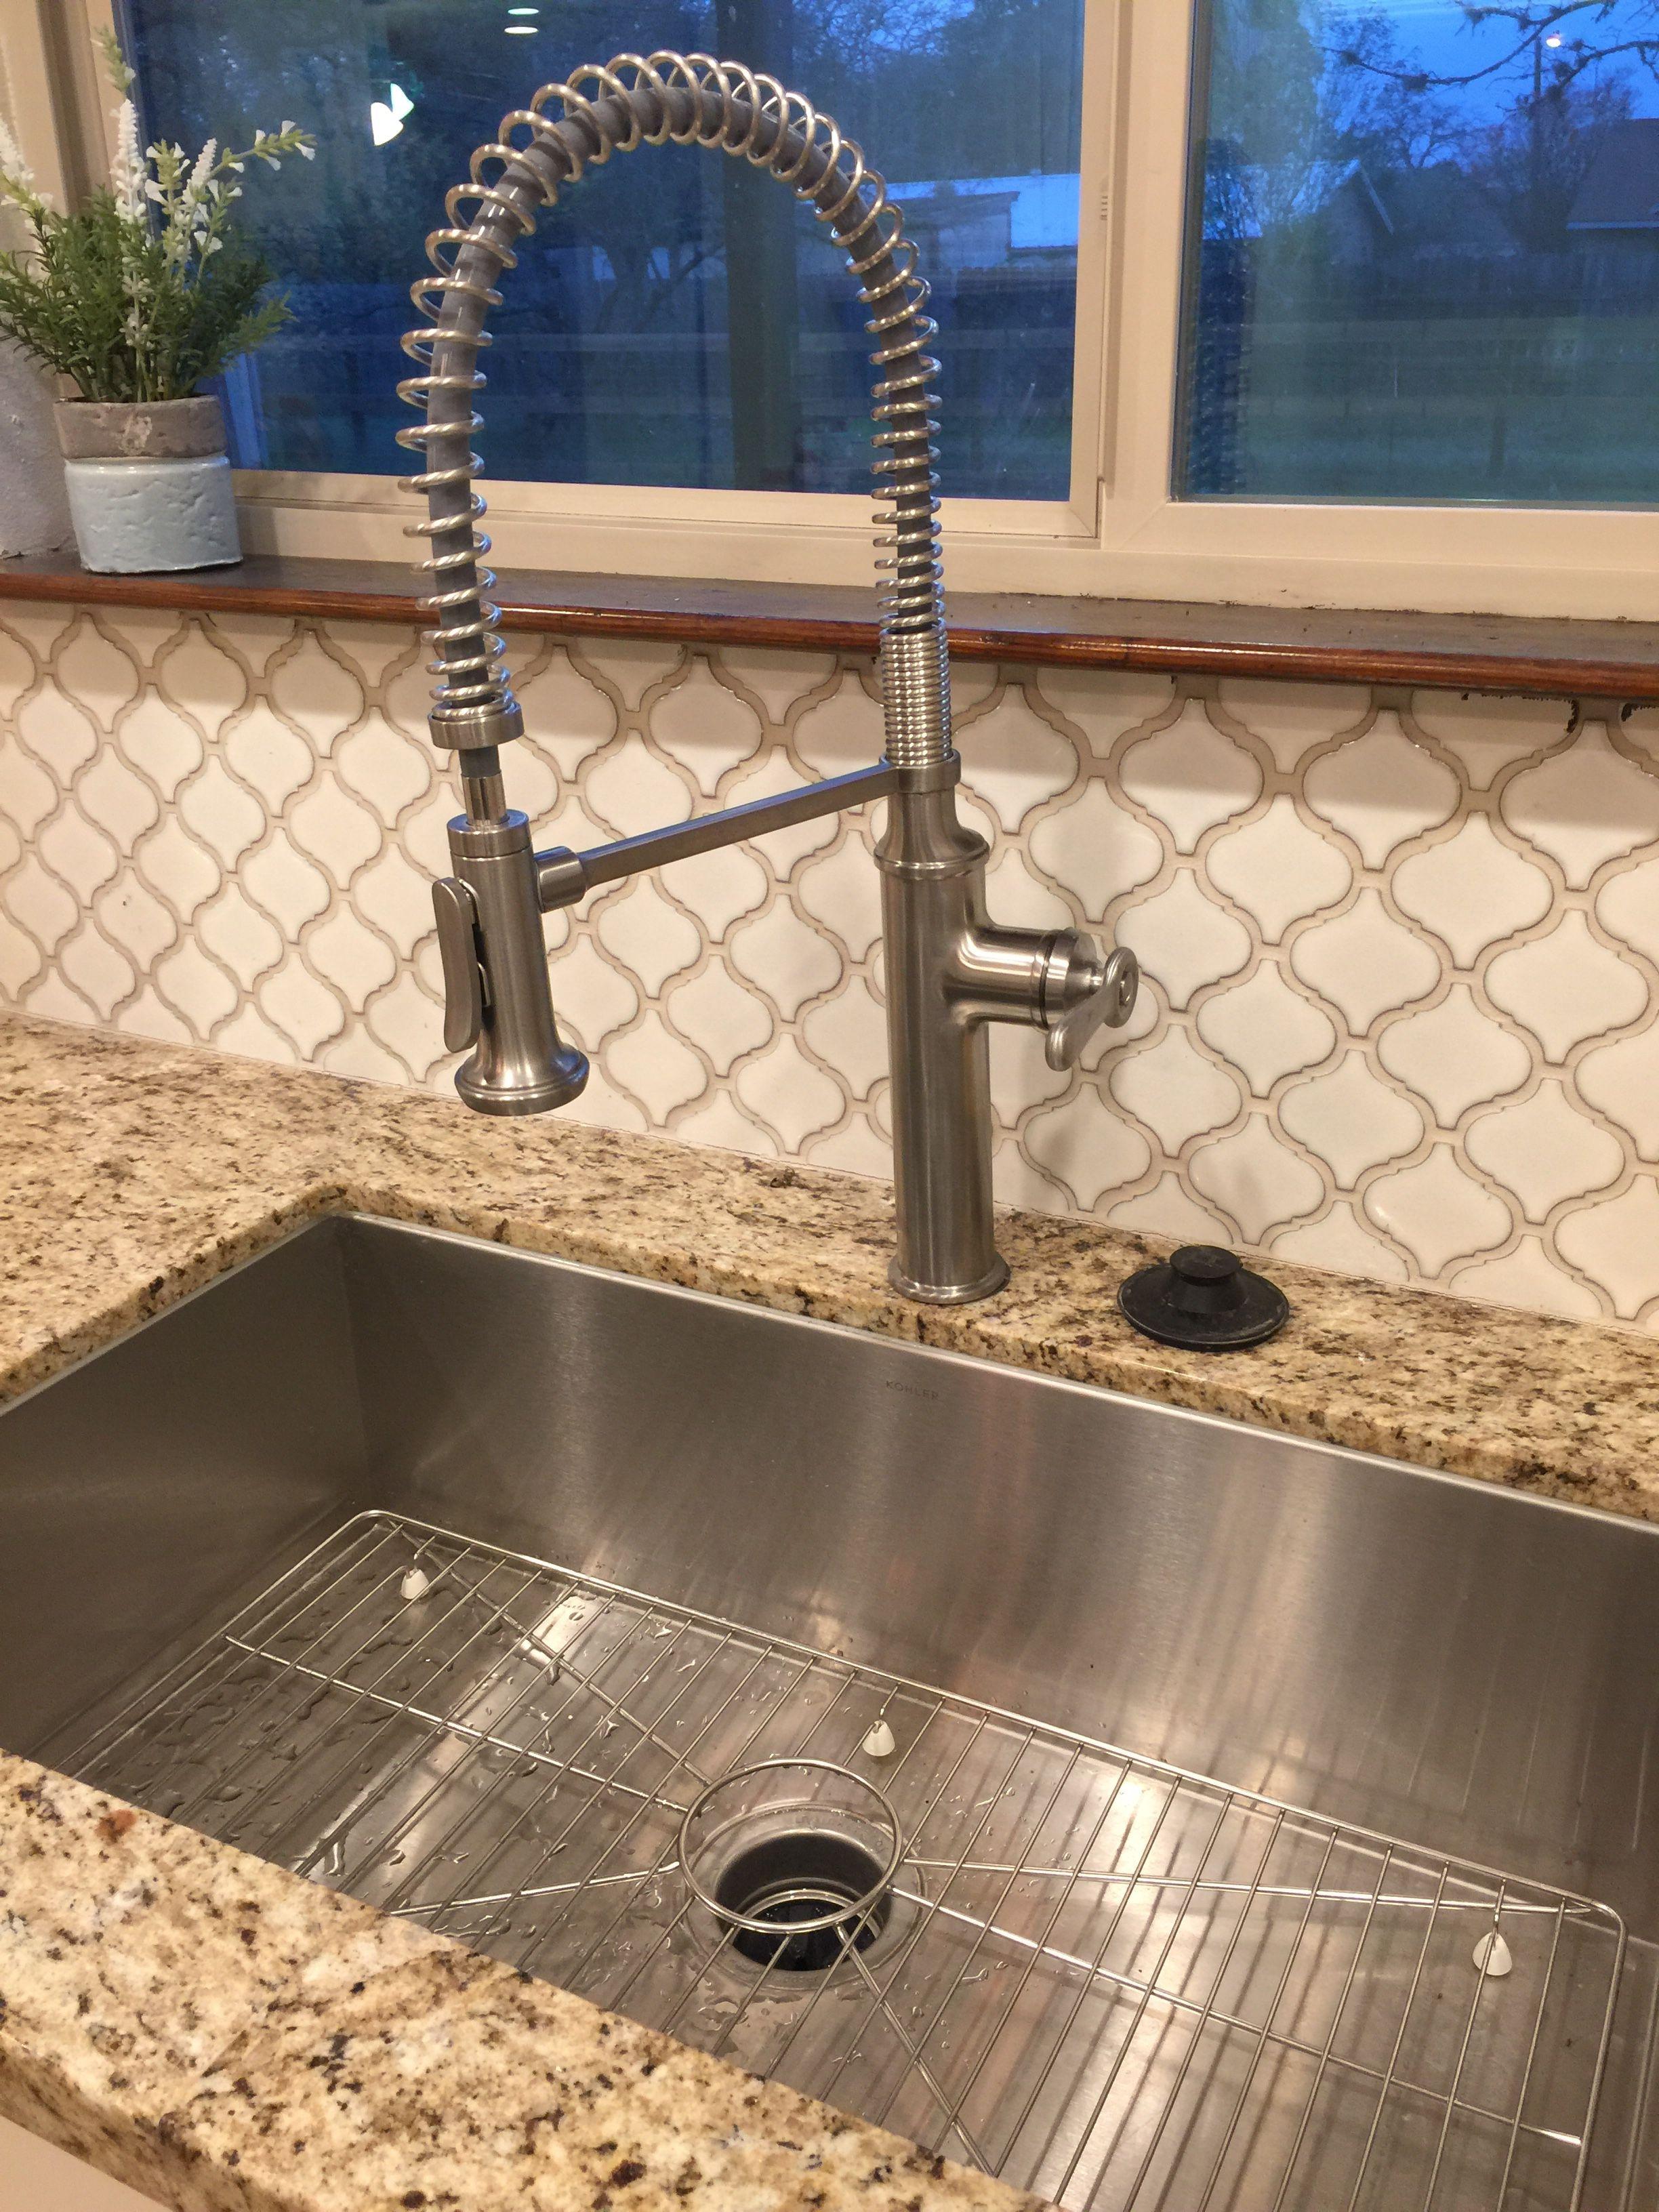 Modern farmhouse like kitchen stainless steel Kohler sink and faucet ...